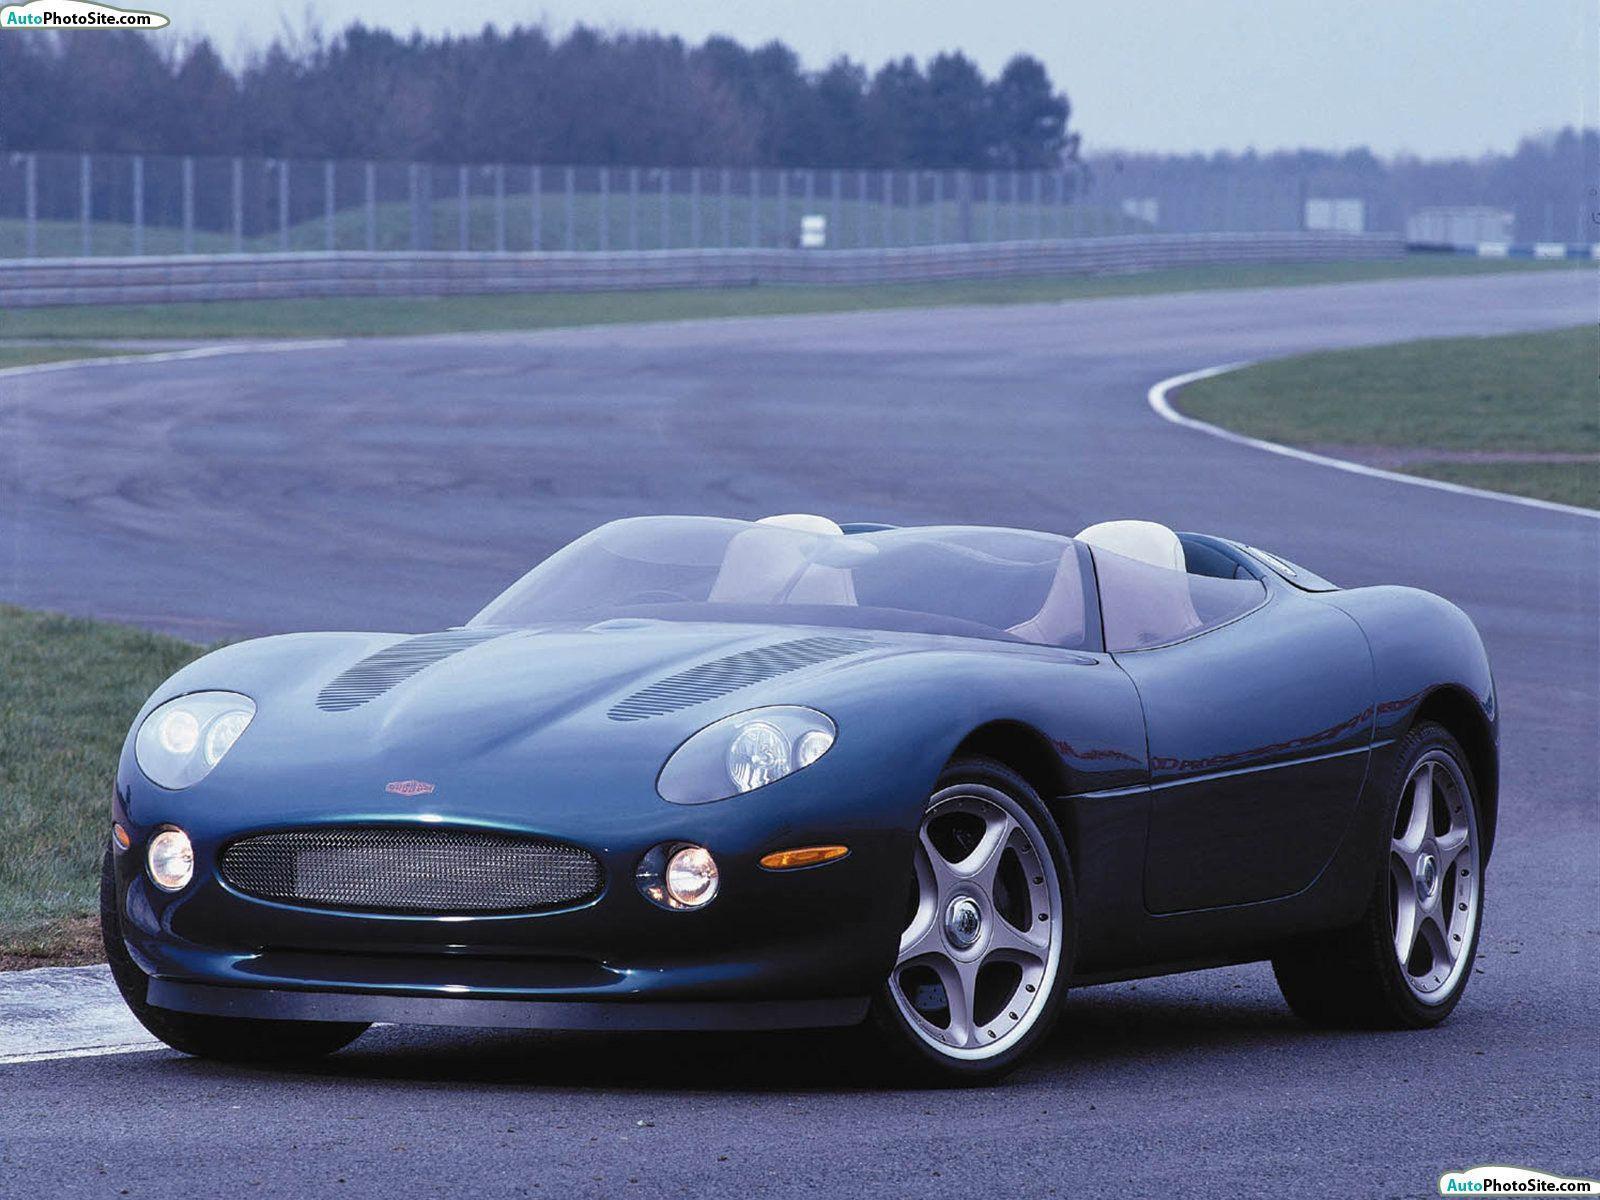 Jaguar XK180. The Prettiest Concept Car Of Them All?